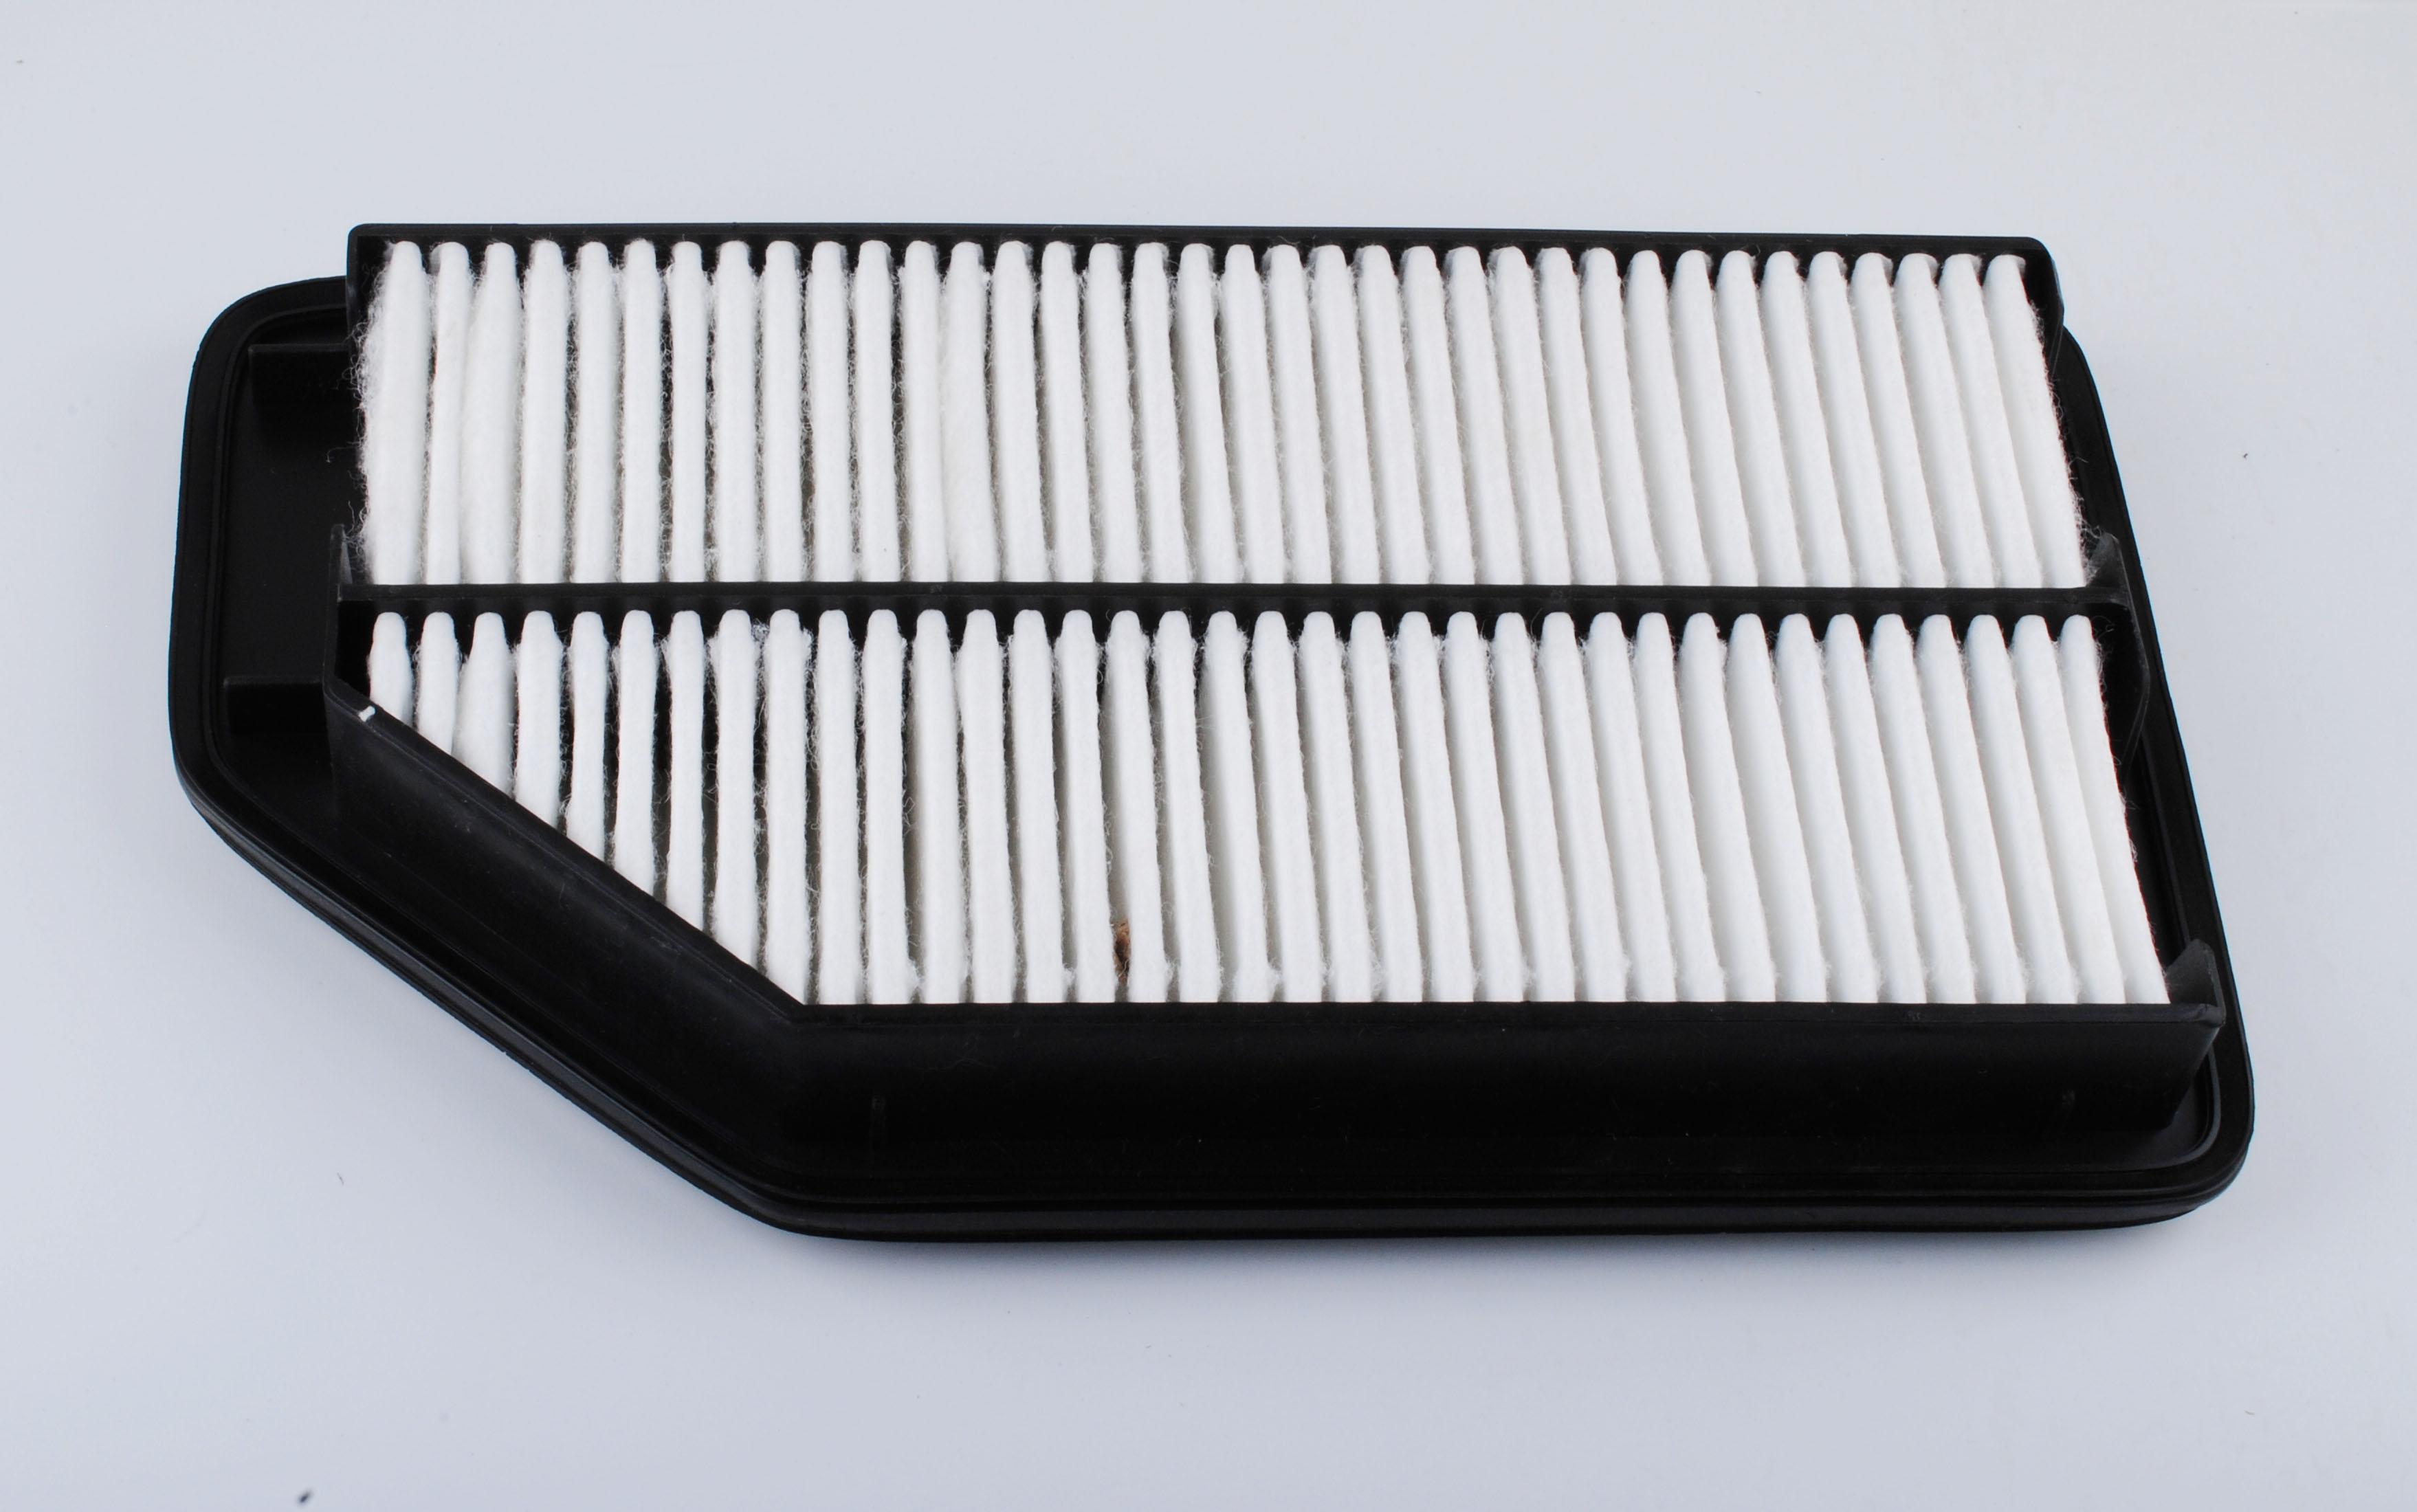 Air Filter For Honda Odyssey Oe 17220 Rv0 A00 V6 35l Engine 2015 Oil Location 2011 New